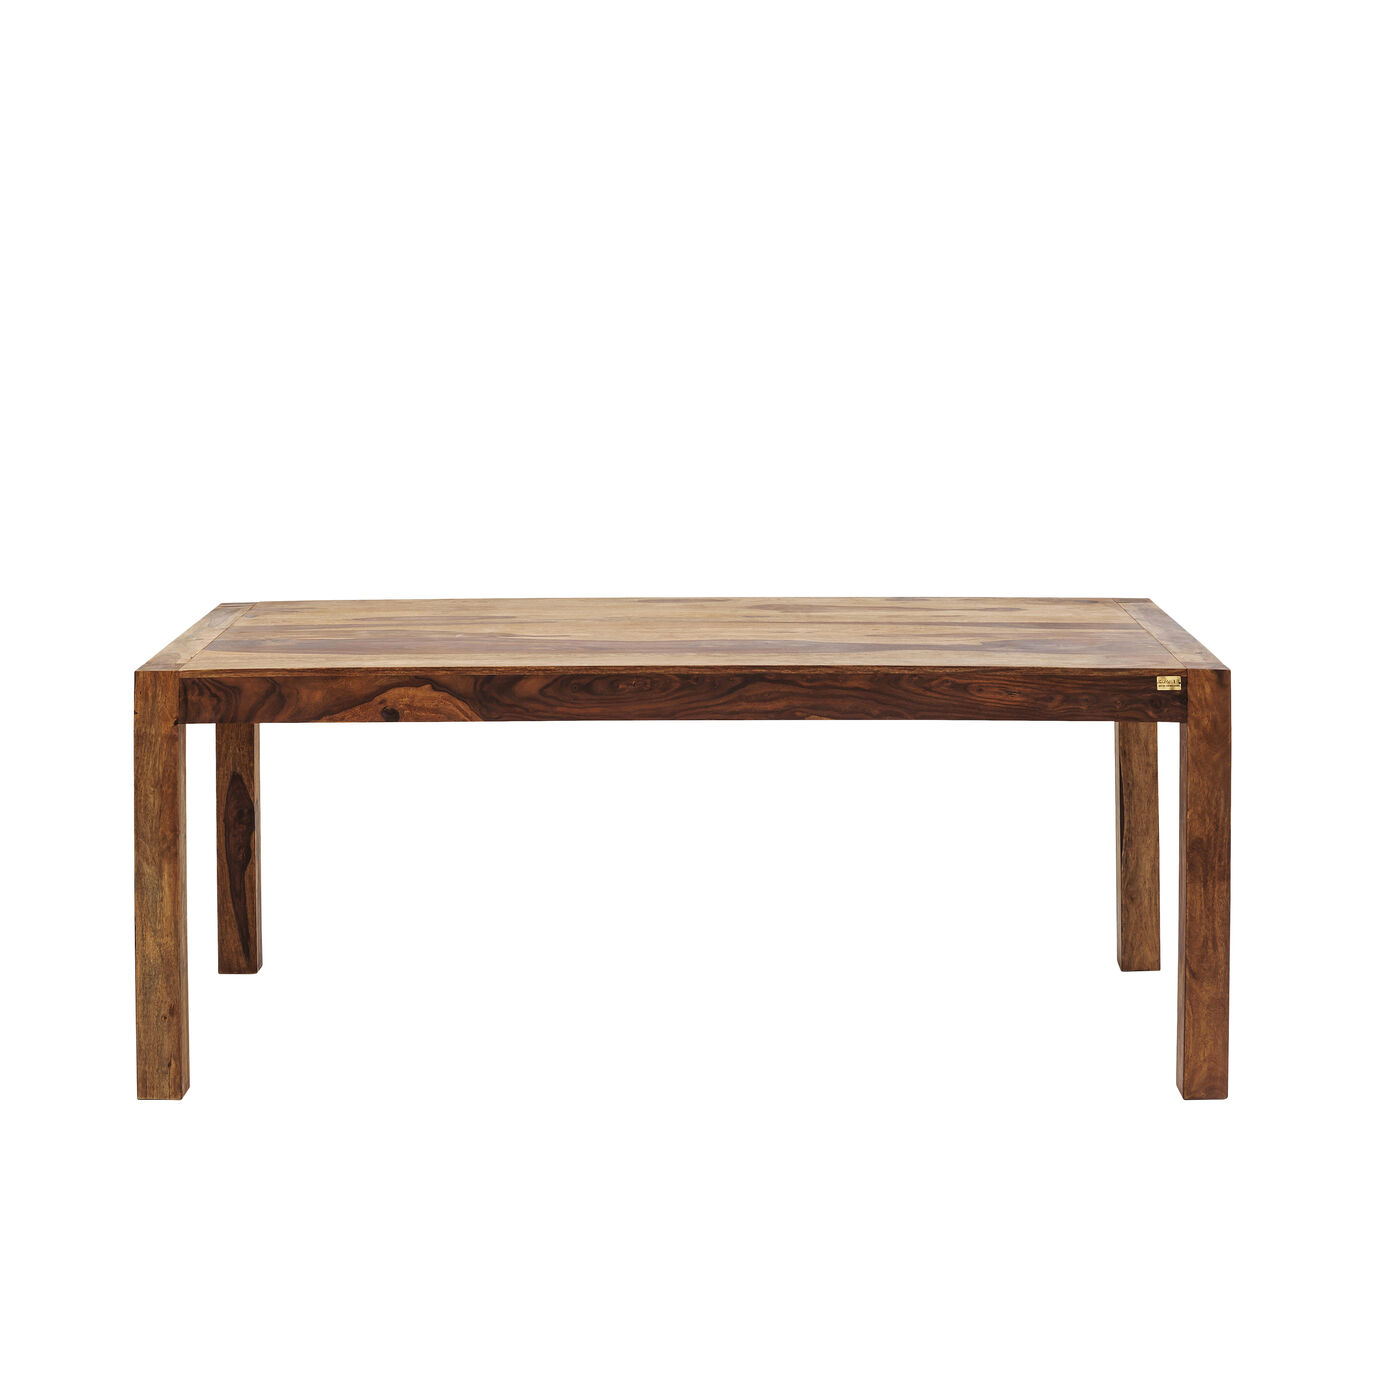 Authentico Tisch 140x80cm